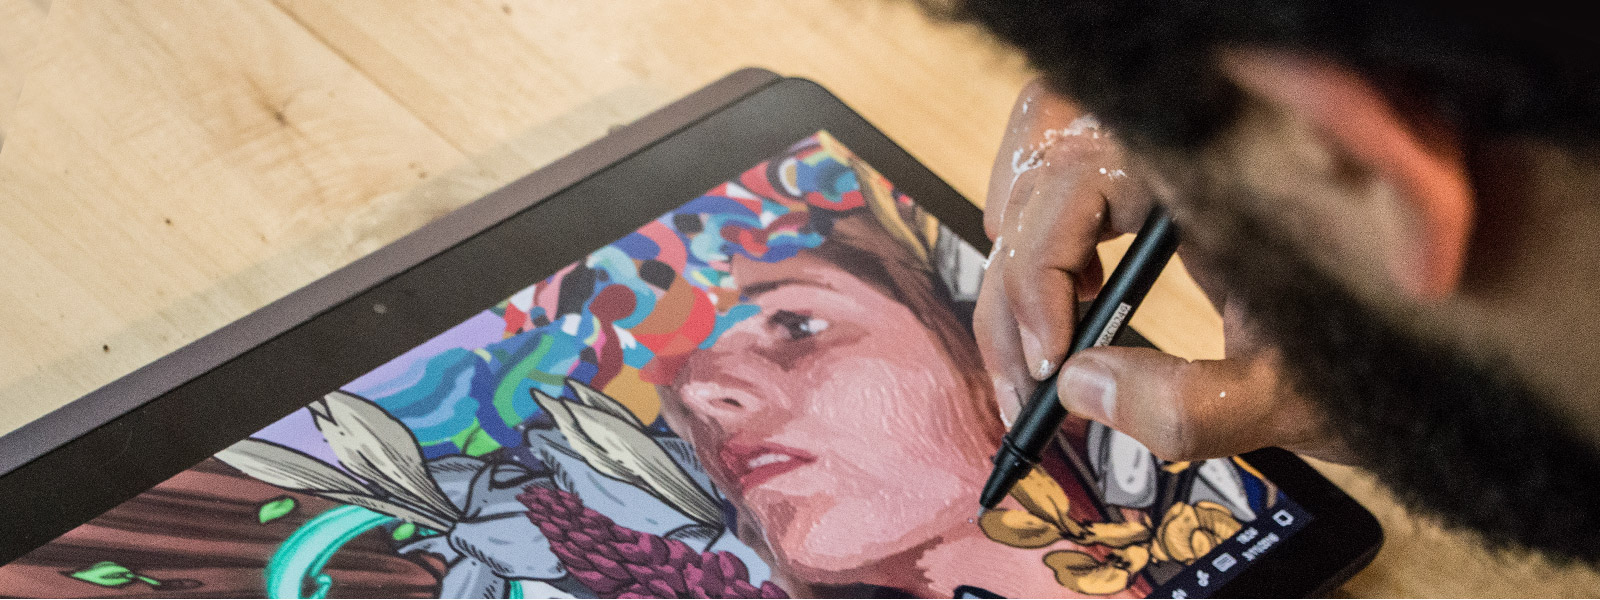 Windows Ink on Lenovo Yoga tablet mode